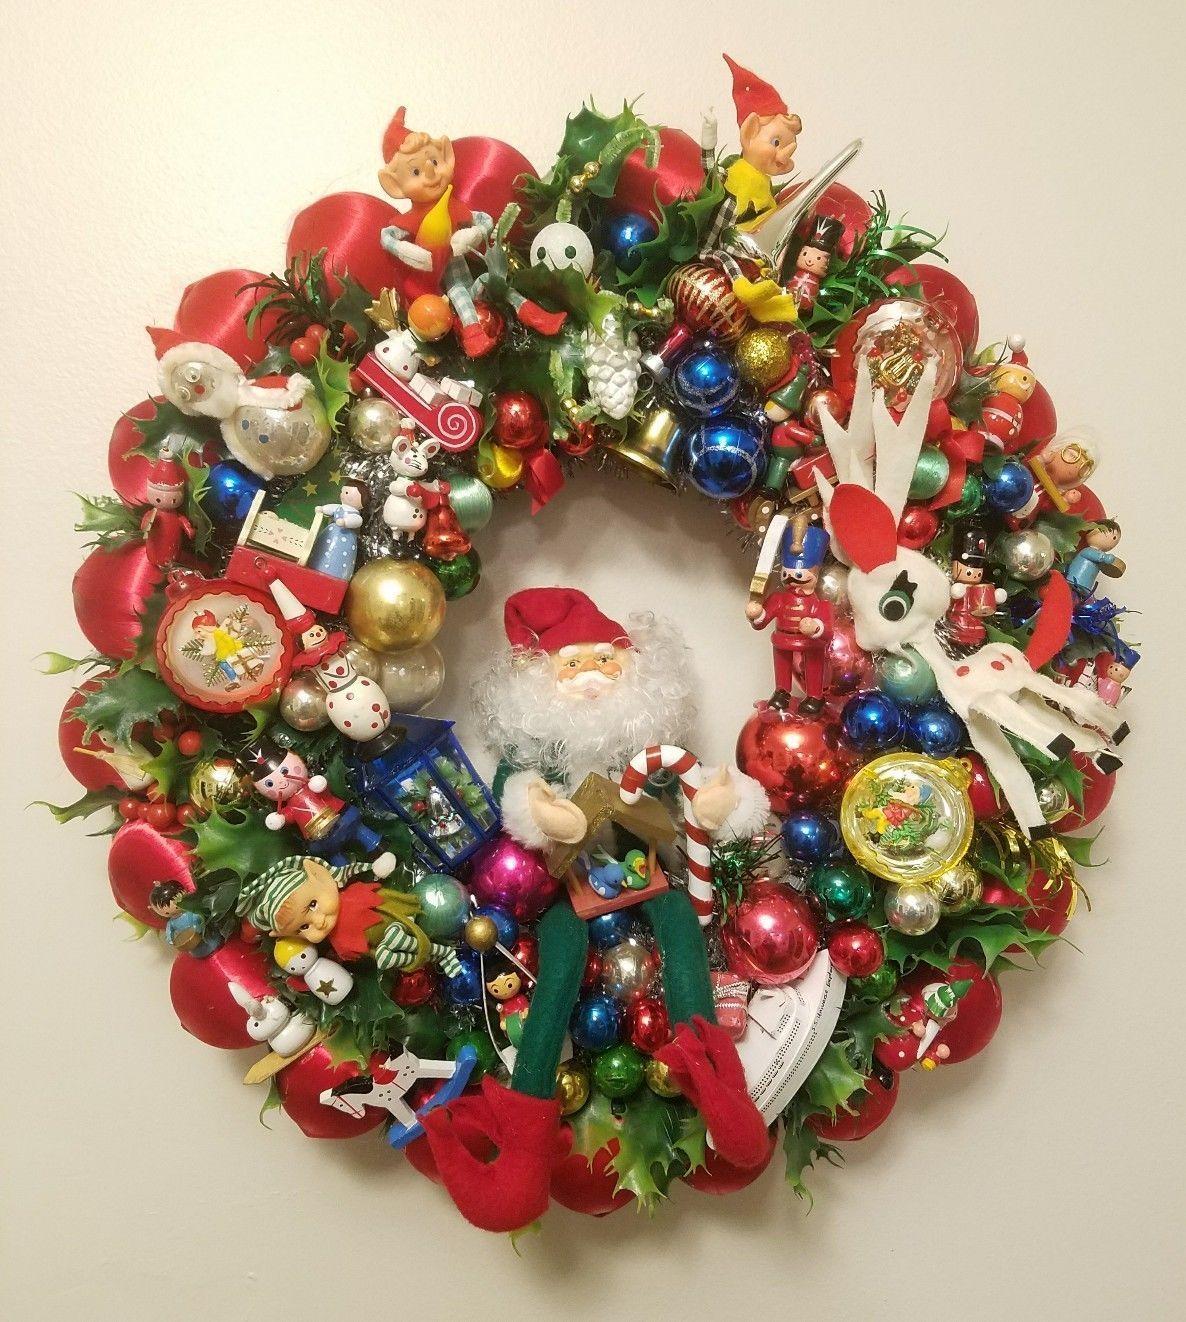 Vintage Christmas Wooden Ornament Wreath Buzztmz Vintage Ornament Wreath Christmas Ornament Wreath Christmas Wreaths